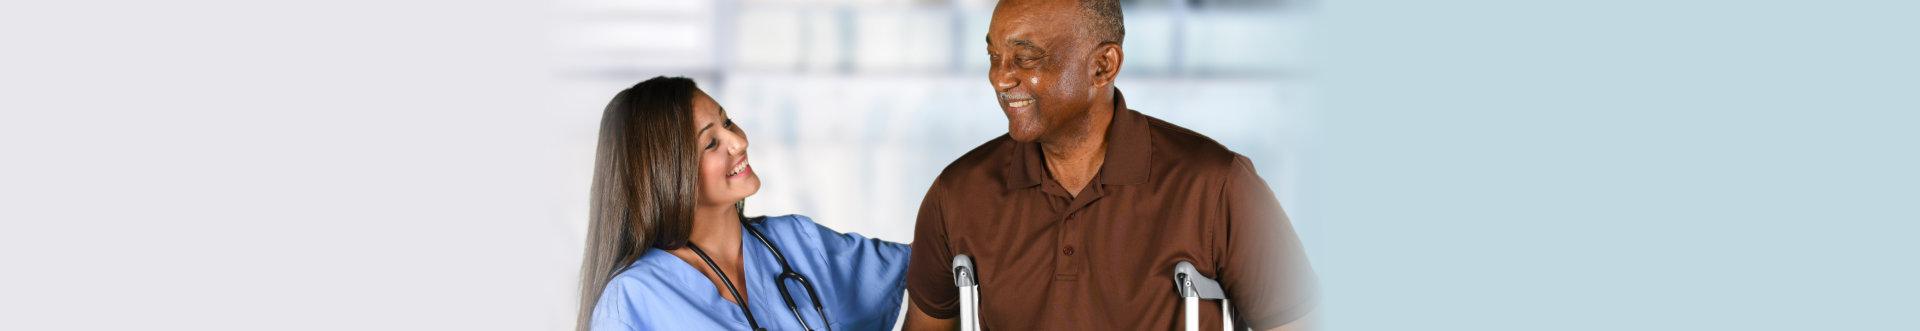 caregiver woman looking at senior man